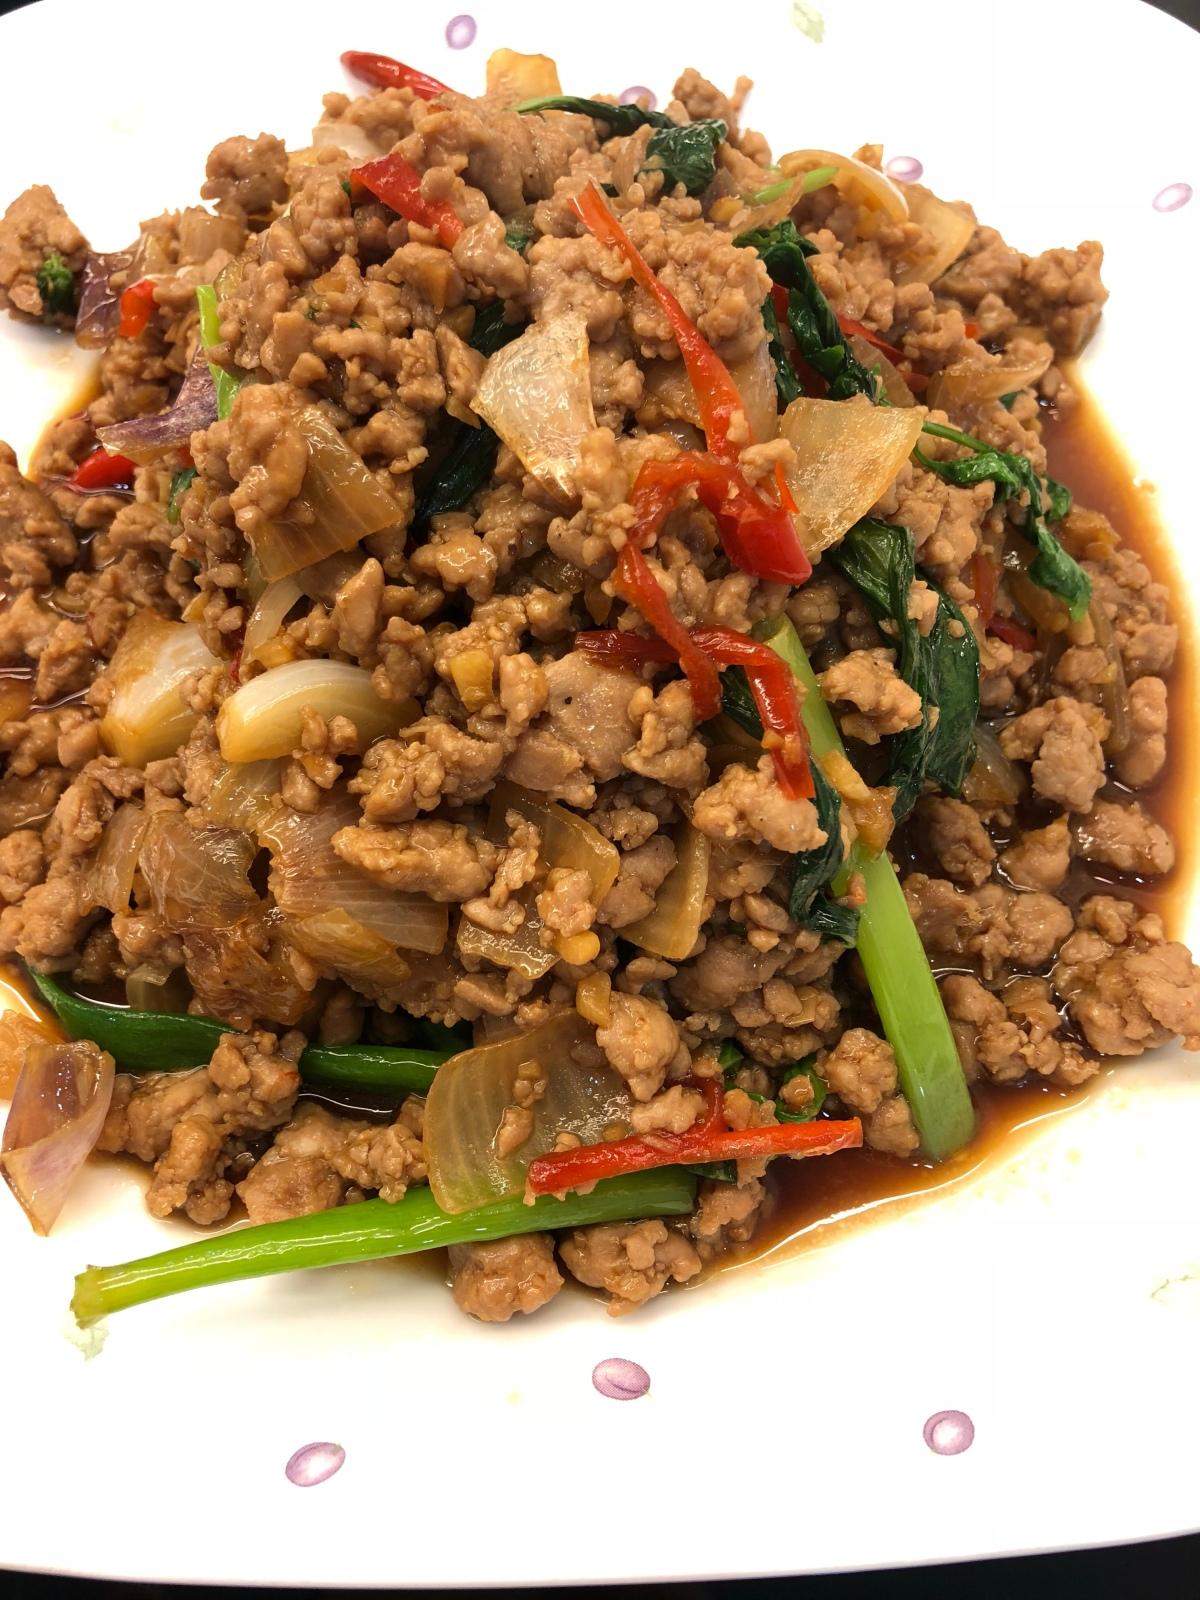 Thai Style Stir-Fry Minced Pork with Basil Leaves (4servings)